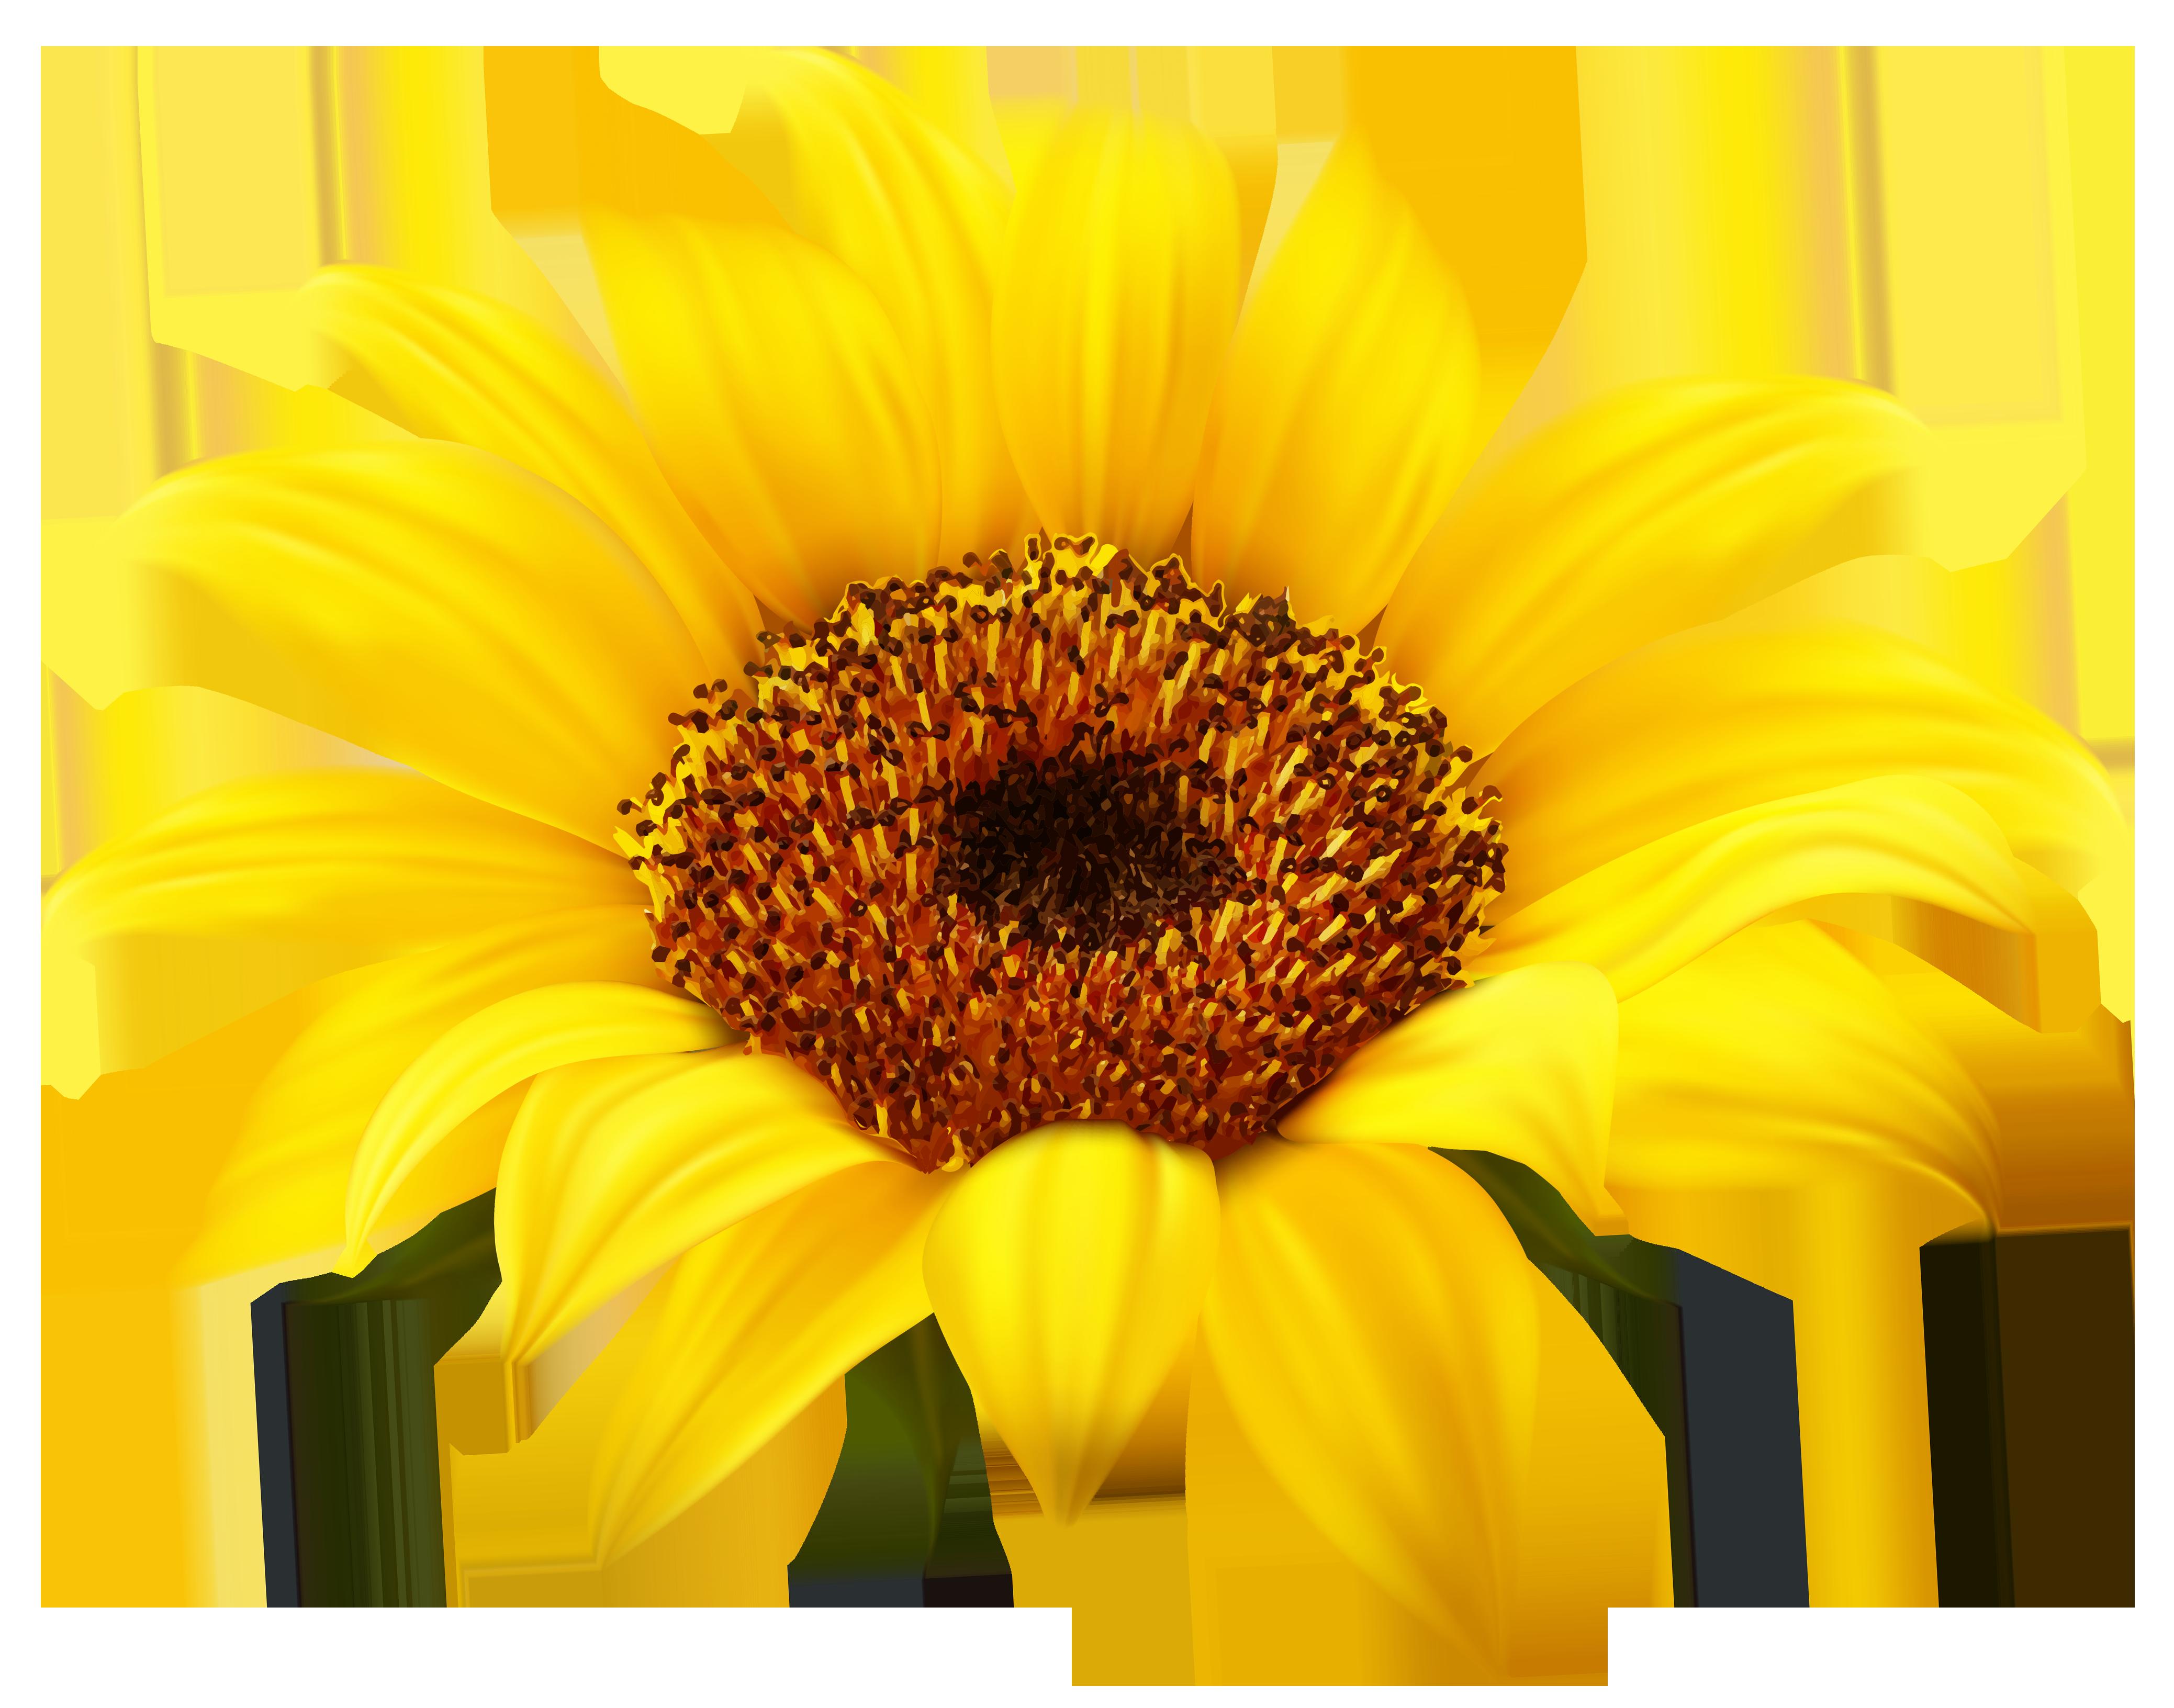 Png image gallery yopriceville. Garden clipart sunflower